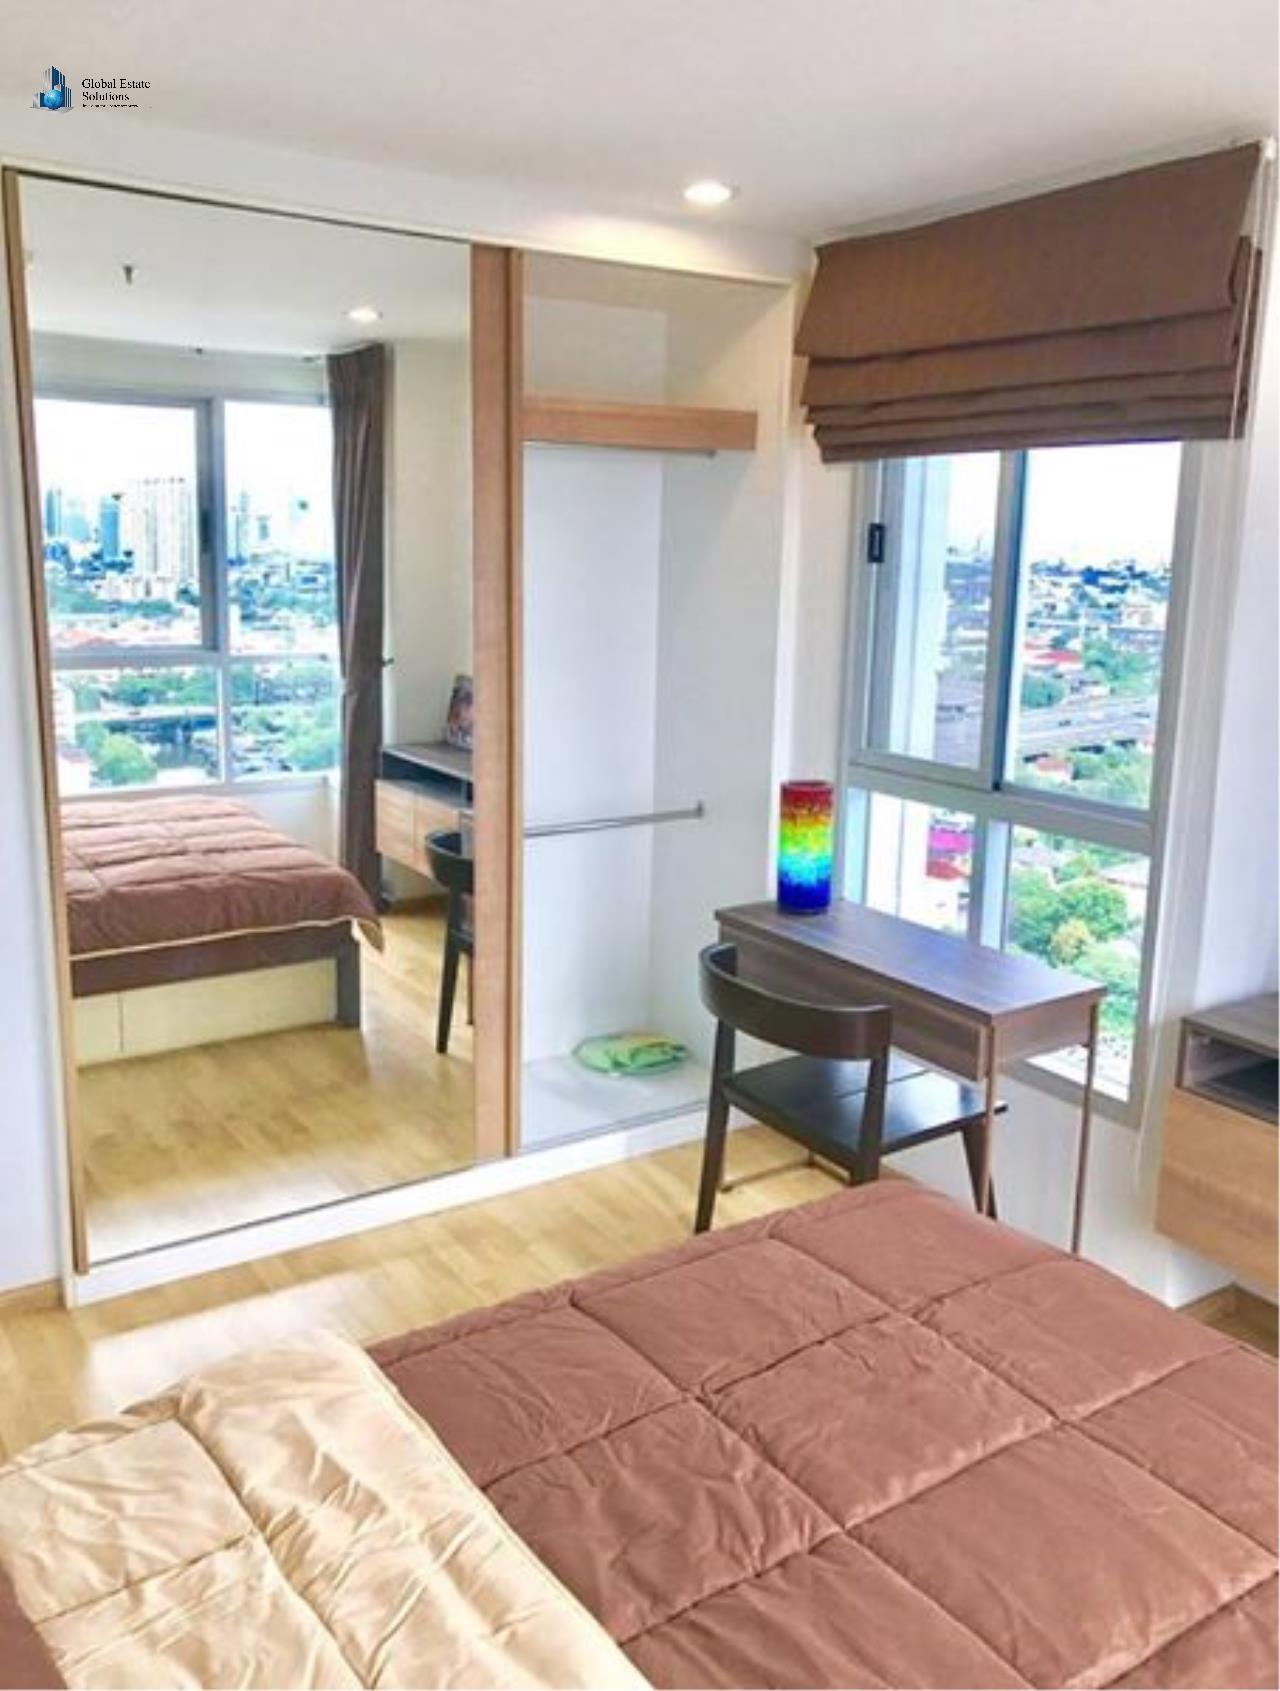 Global Estate Solutions Co., Ltd. Agency's U delight residence  pattanakarn-thonglor 3